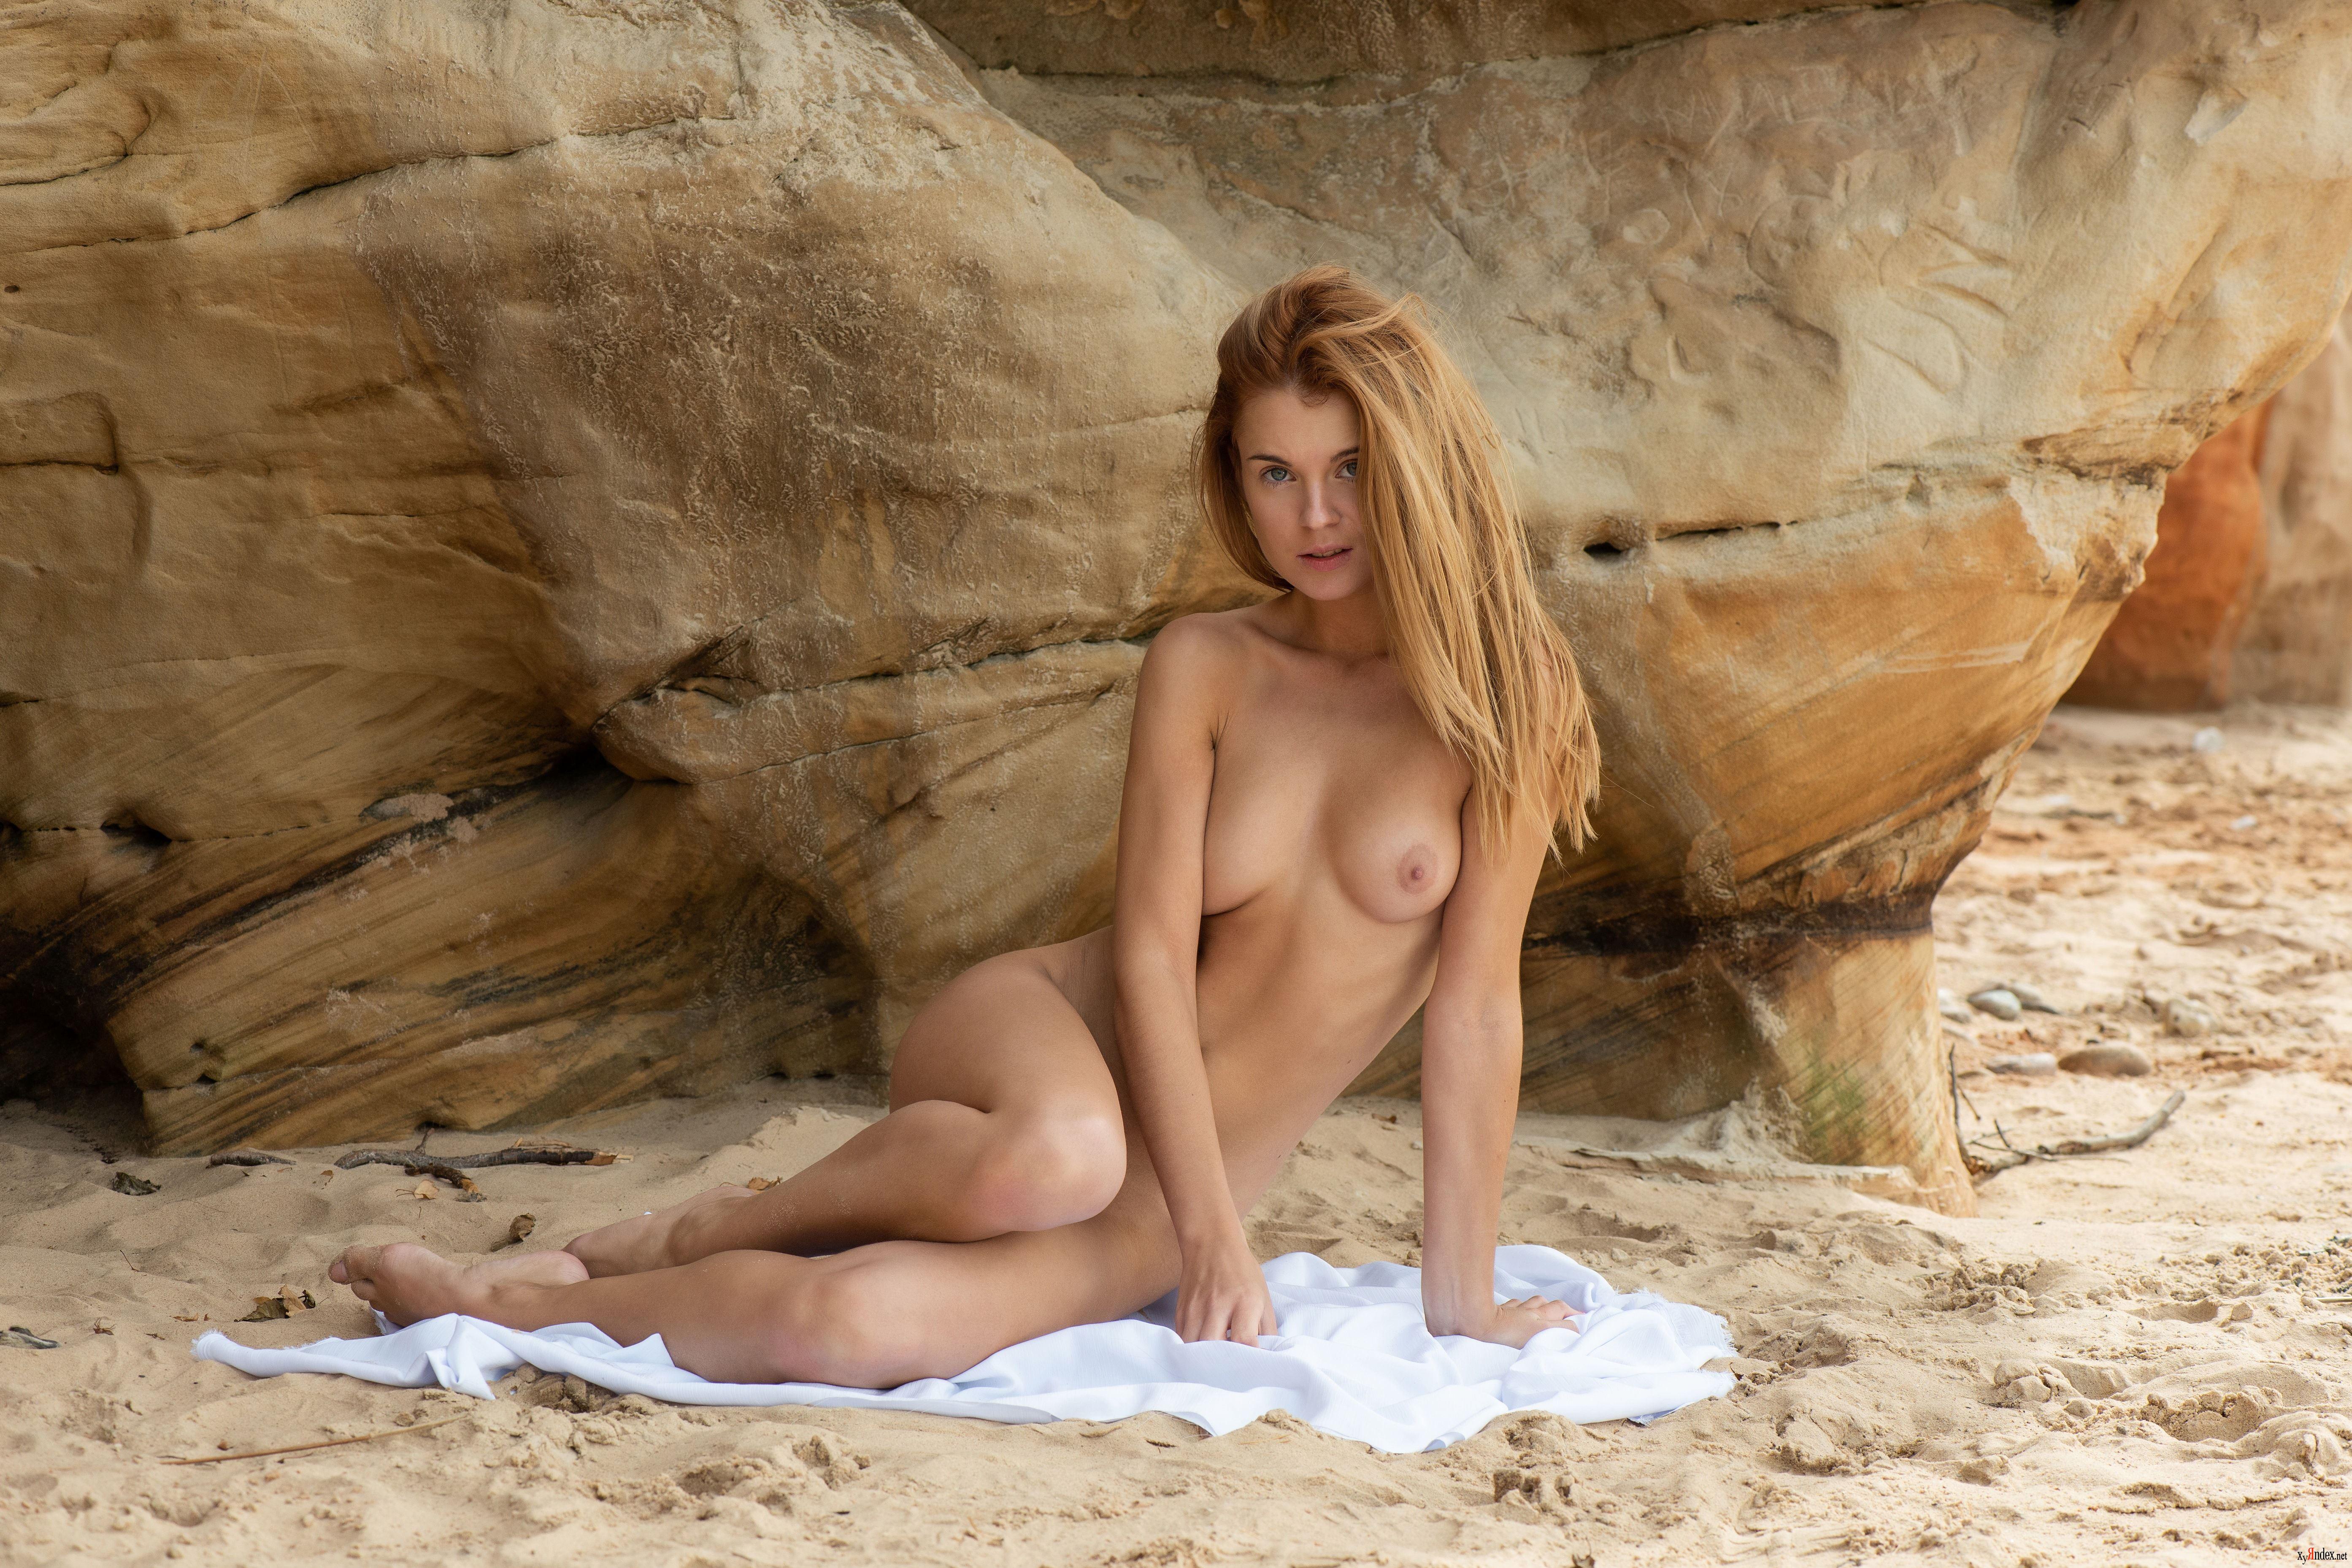 Spanish nude tv host free sex pics